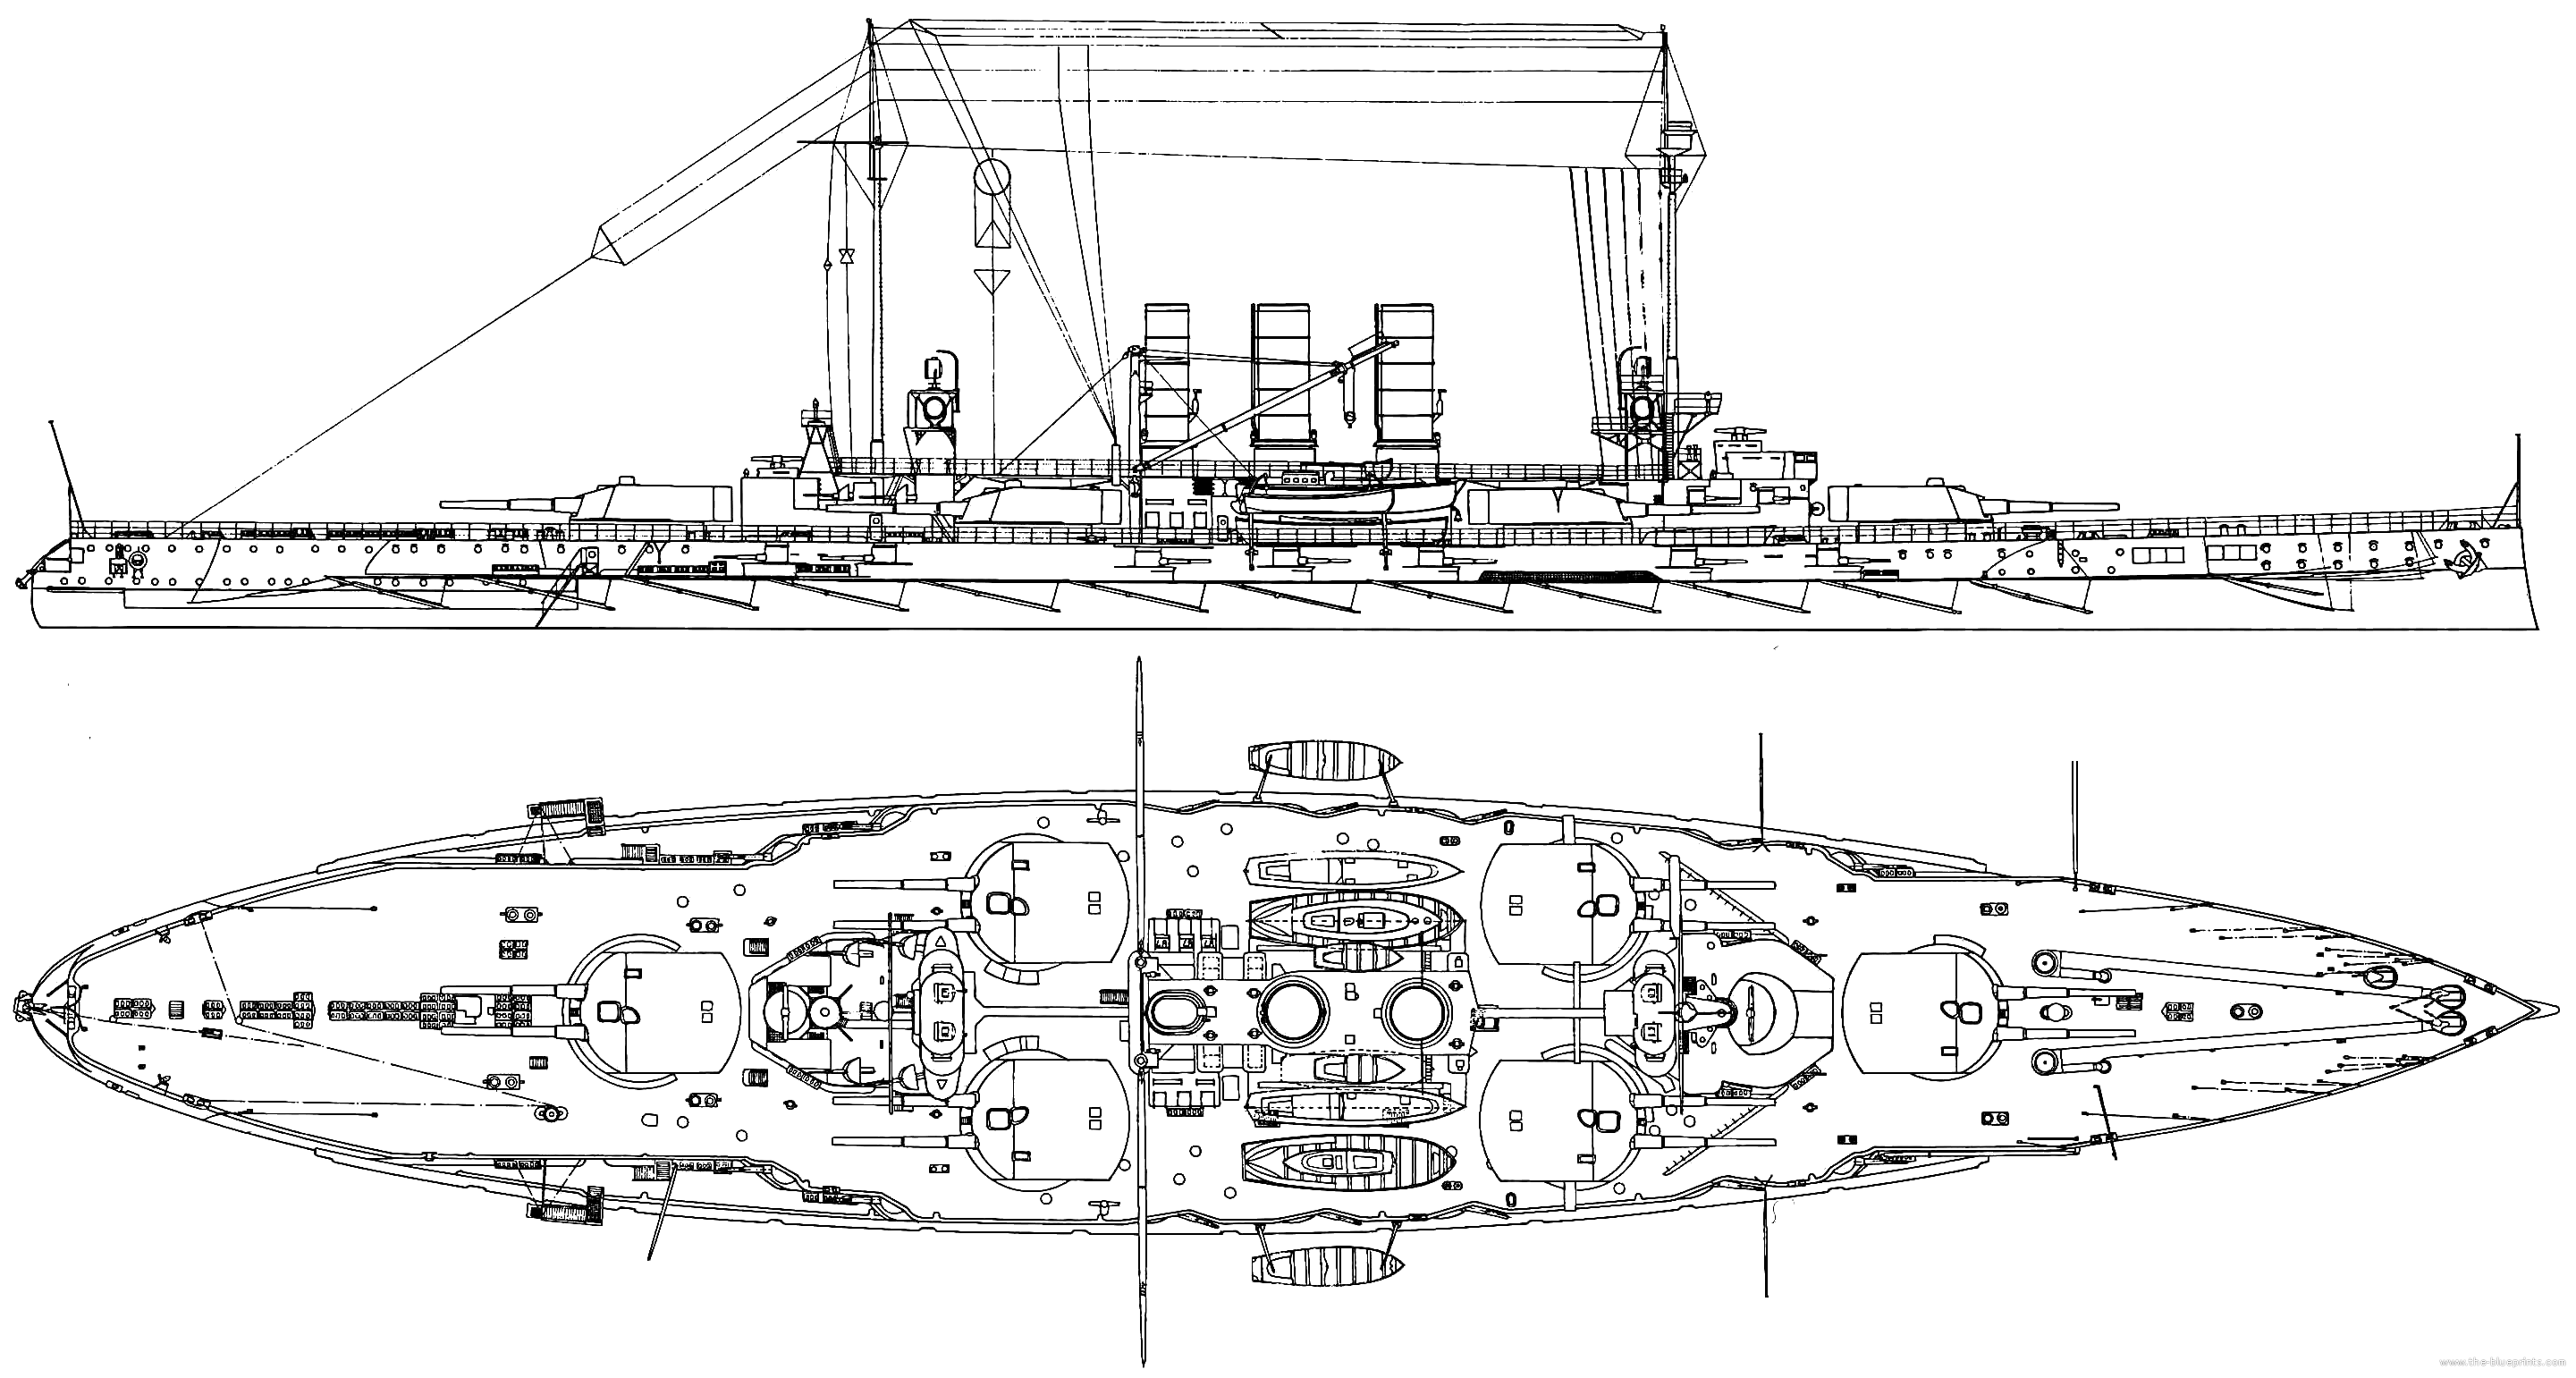 Warship wednesday sept 25 the lucky o laststandonzombieisland sms oldenburg 1913 battleship malvernweather Images